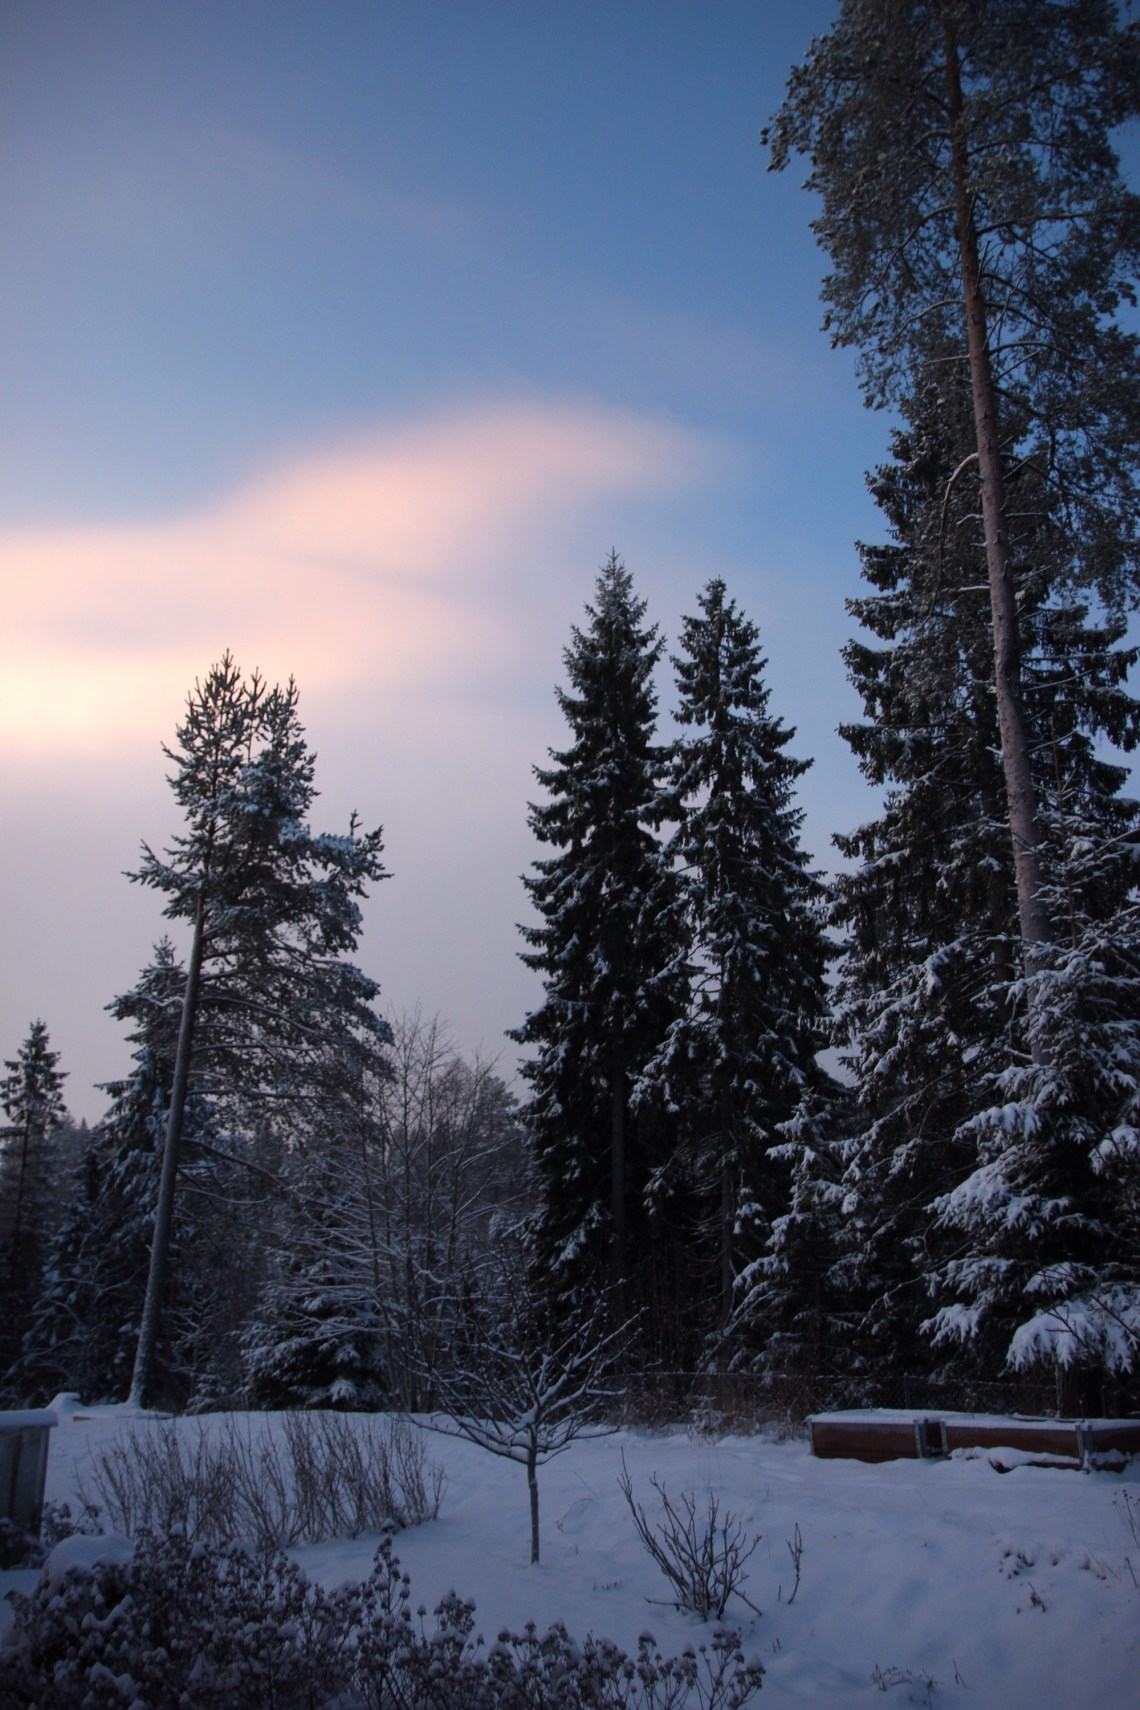 2014/12/img_1675-0.jpg